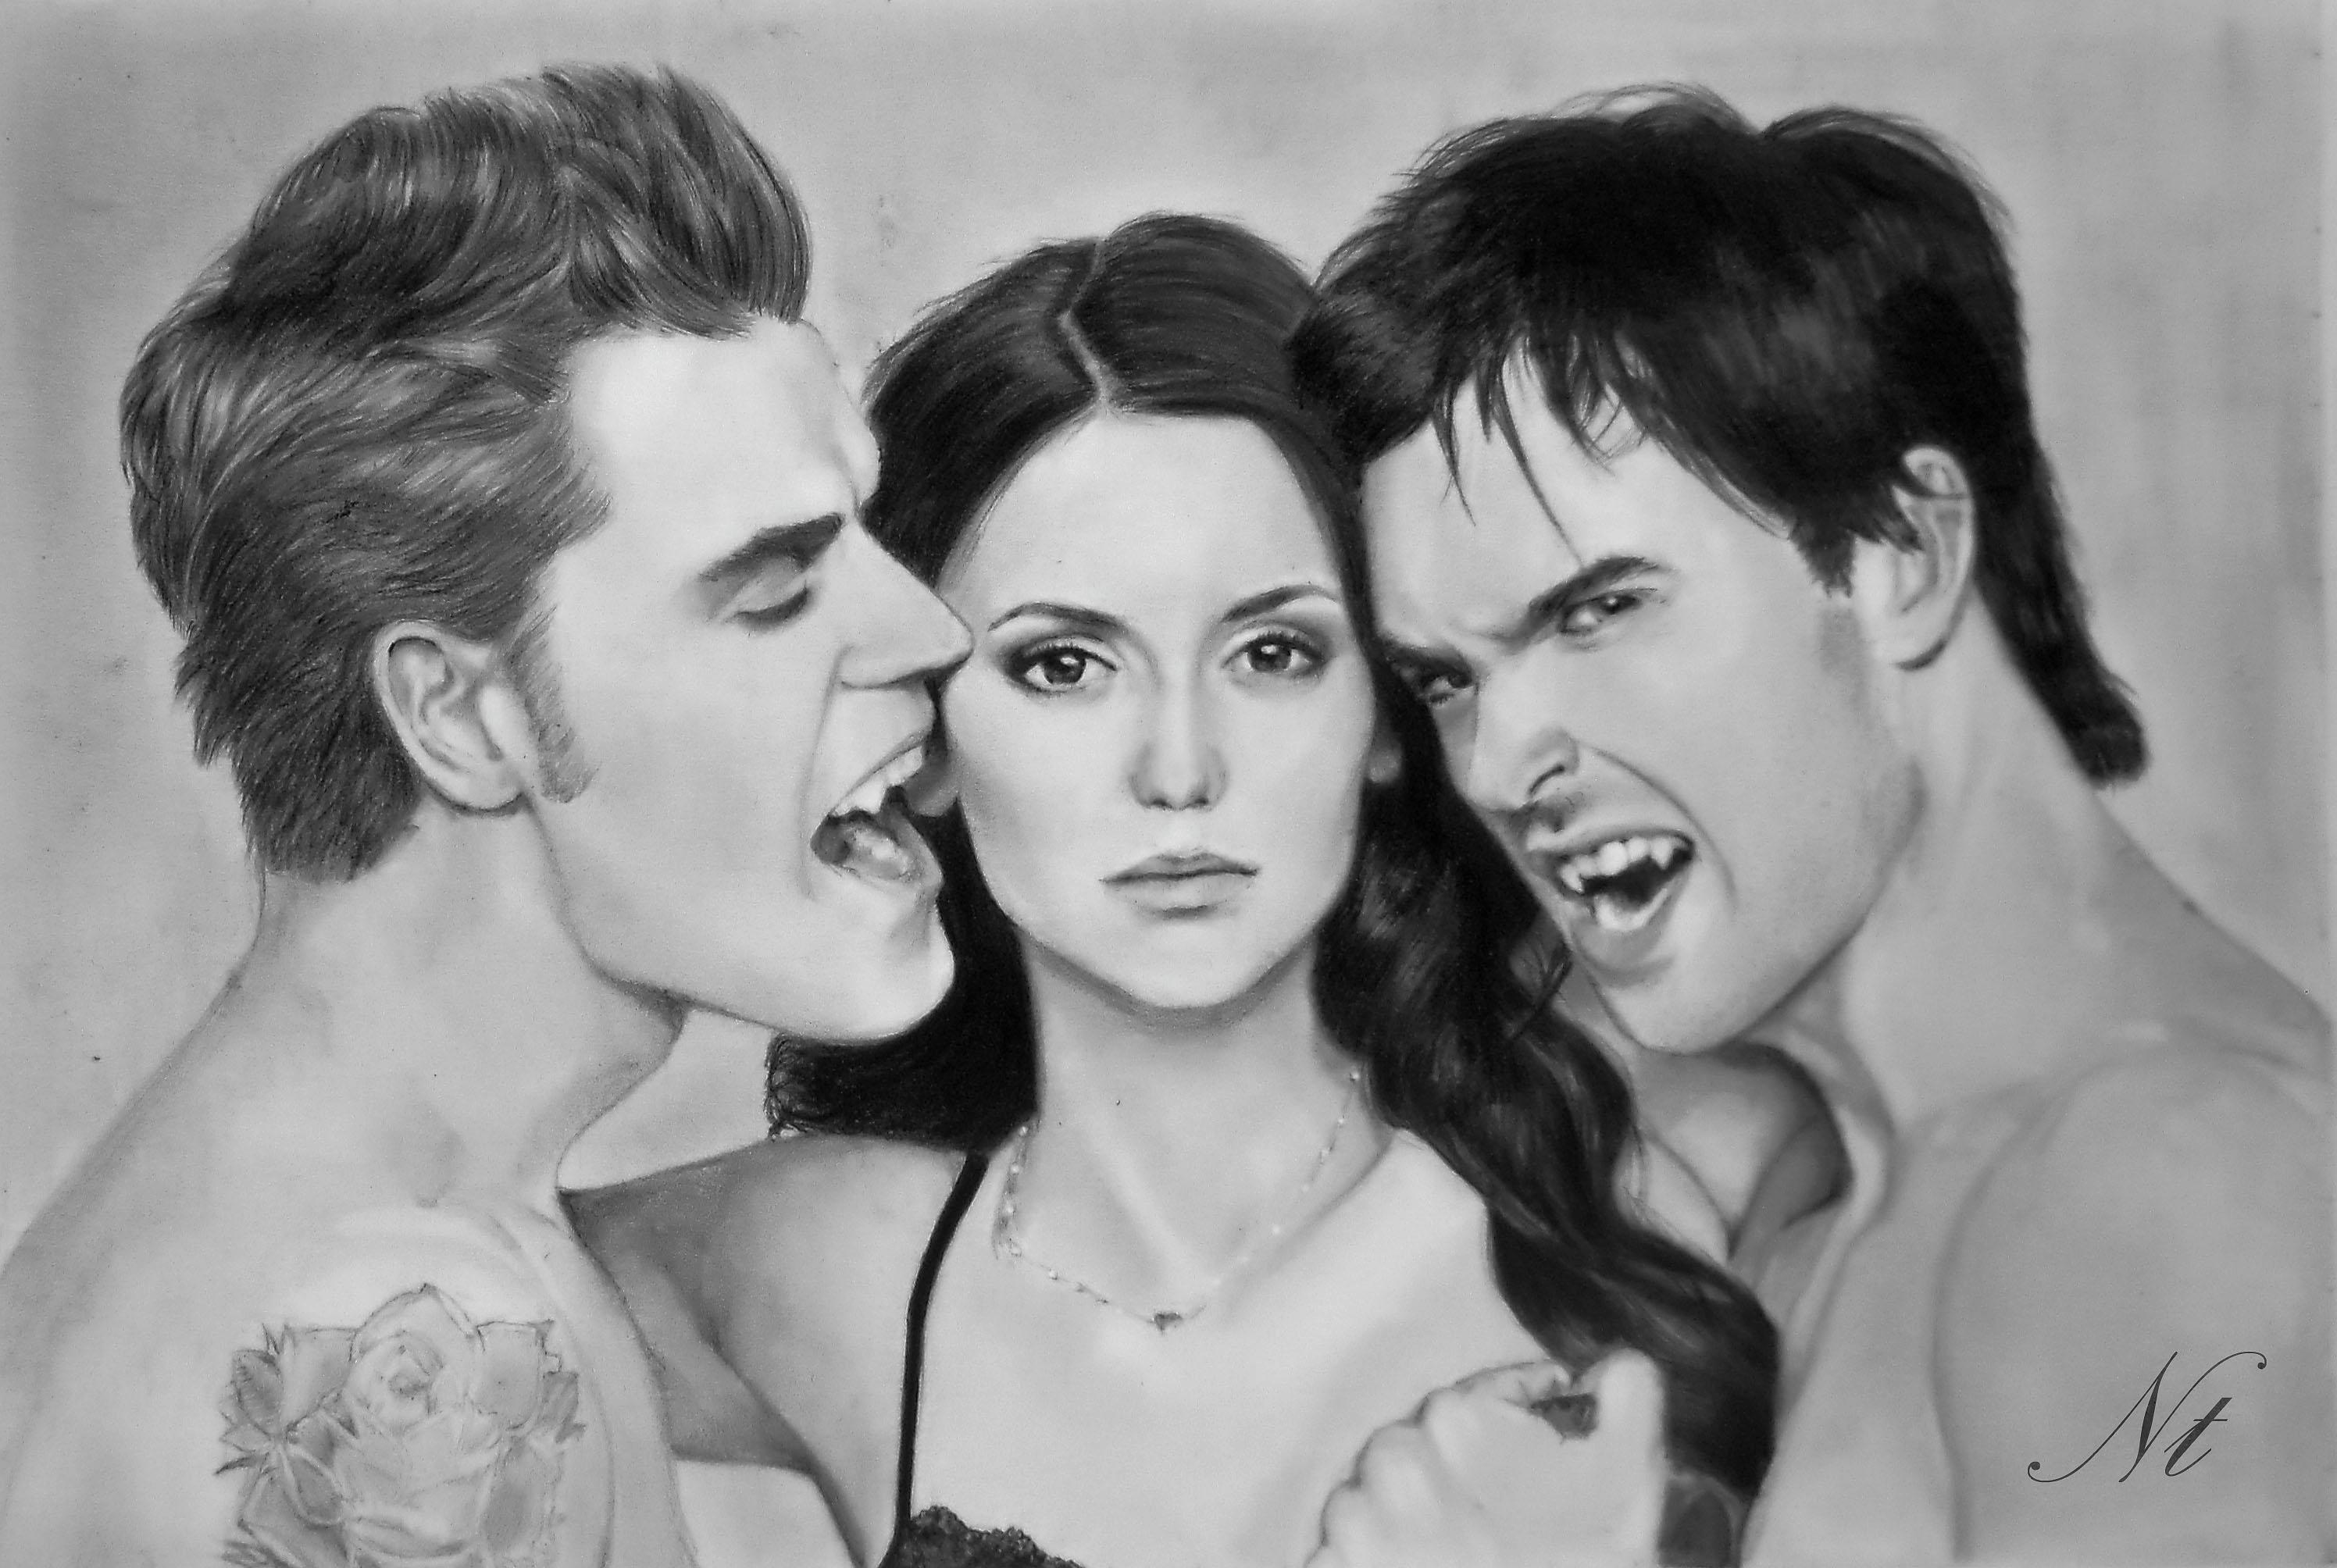 The Vampire Diaries By Natlina On DeviantArt